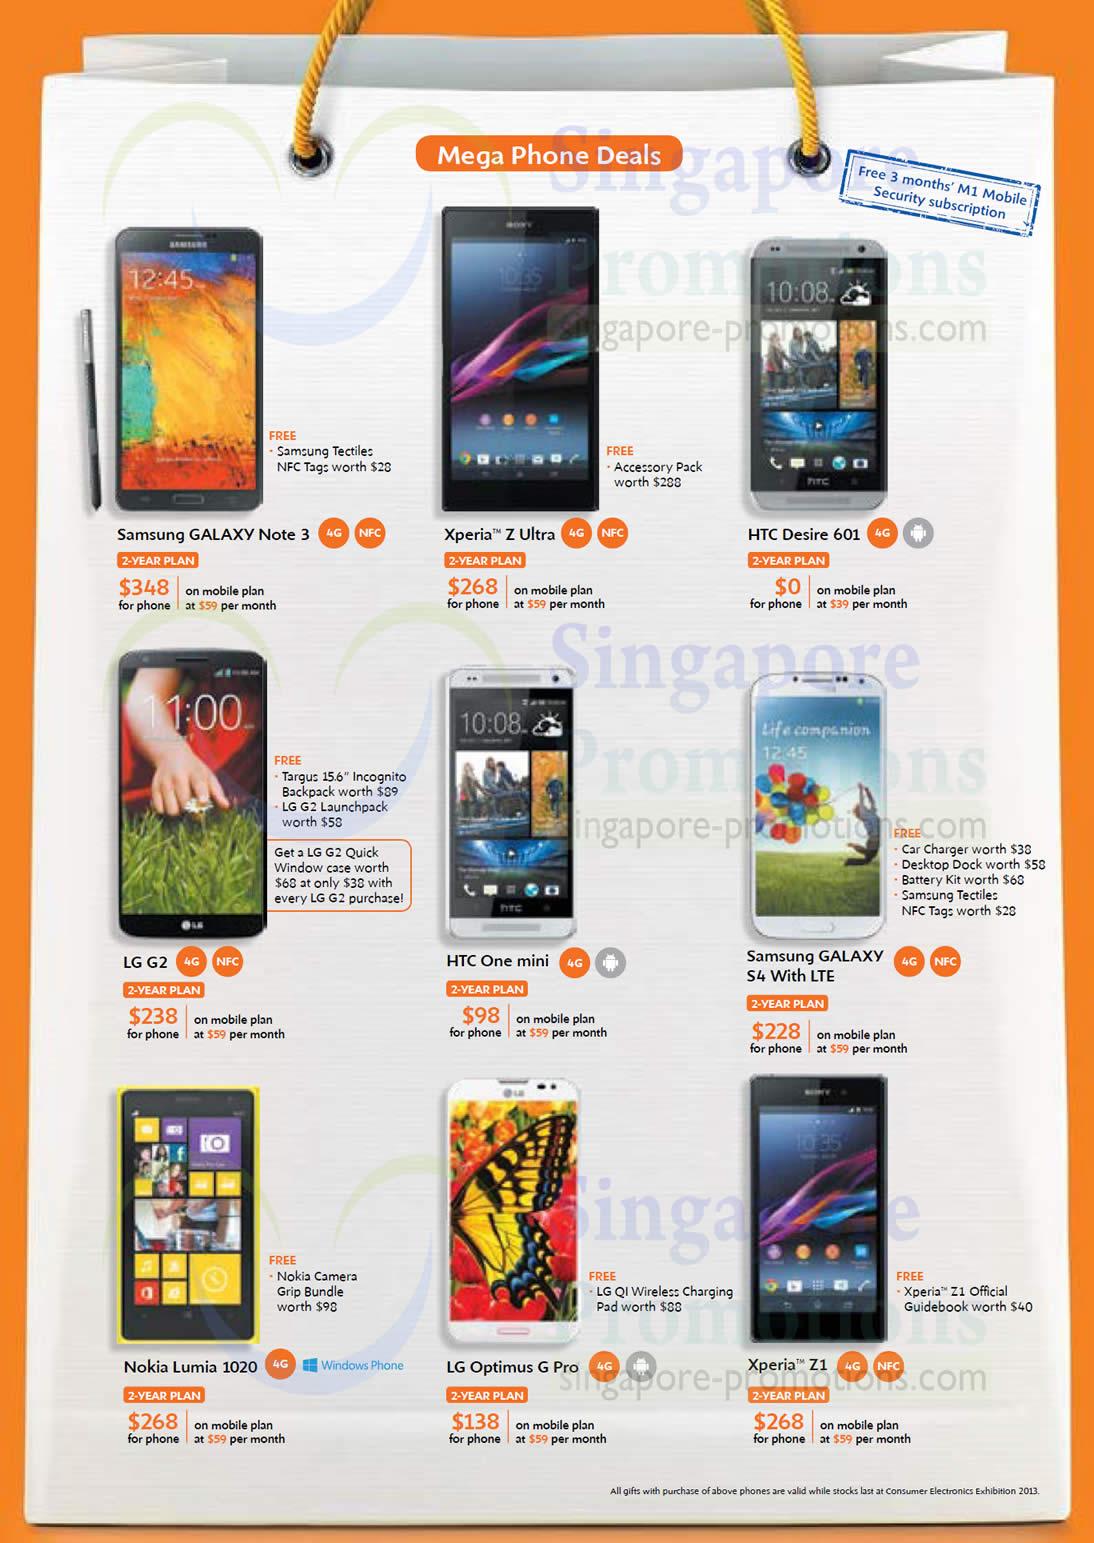 Samsung Galaxy Note 3, S4, Sony Xperia Z Ultra, Z1, HTC Desire 601, One Mini, LG G2, Optimus G Pro, Nokia Lumia 1020